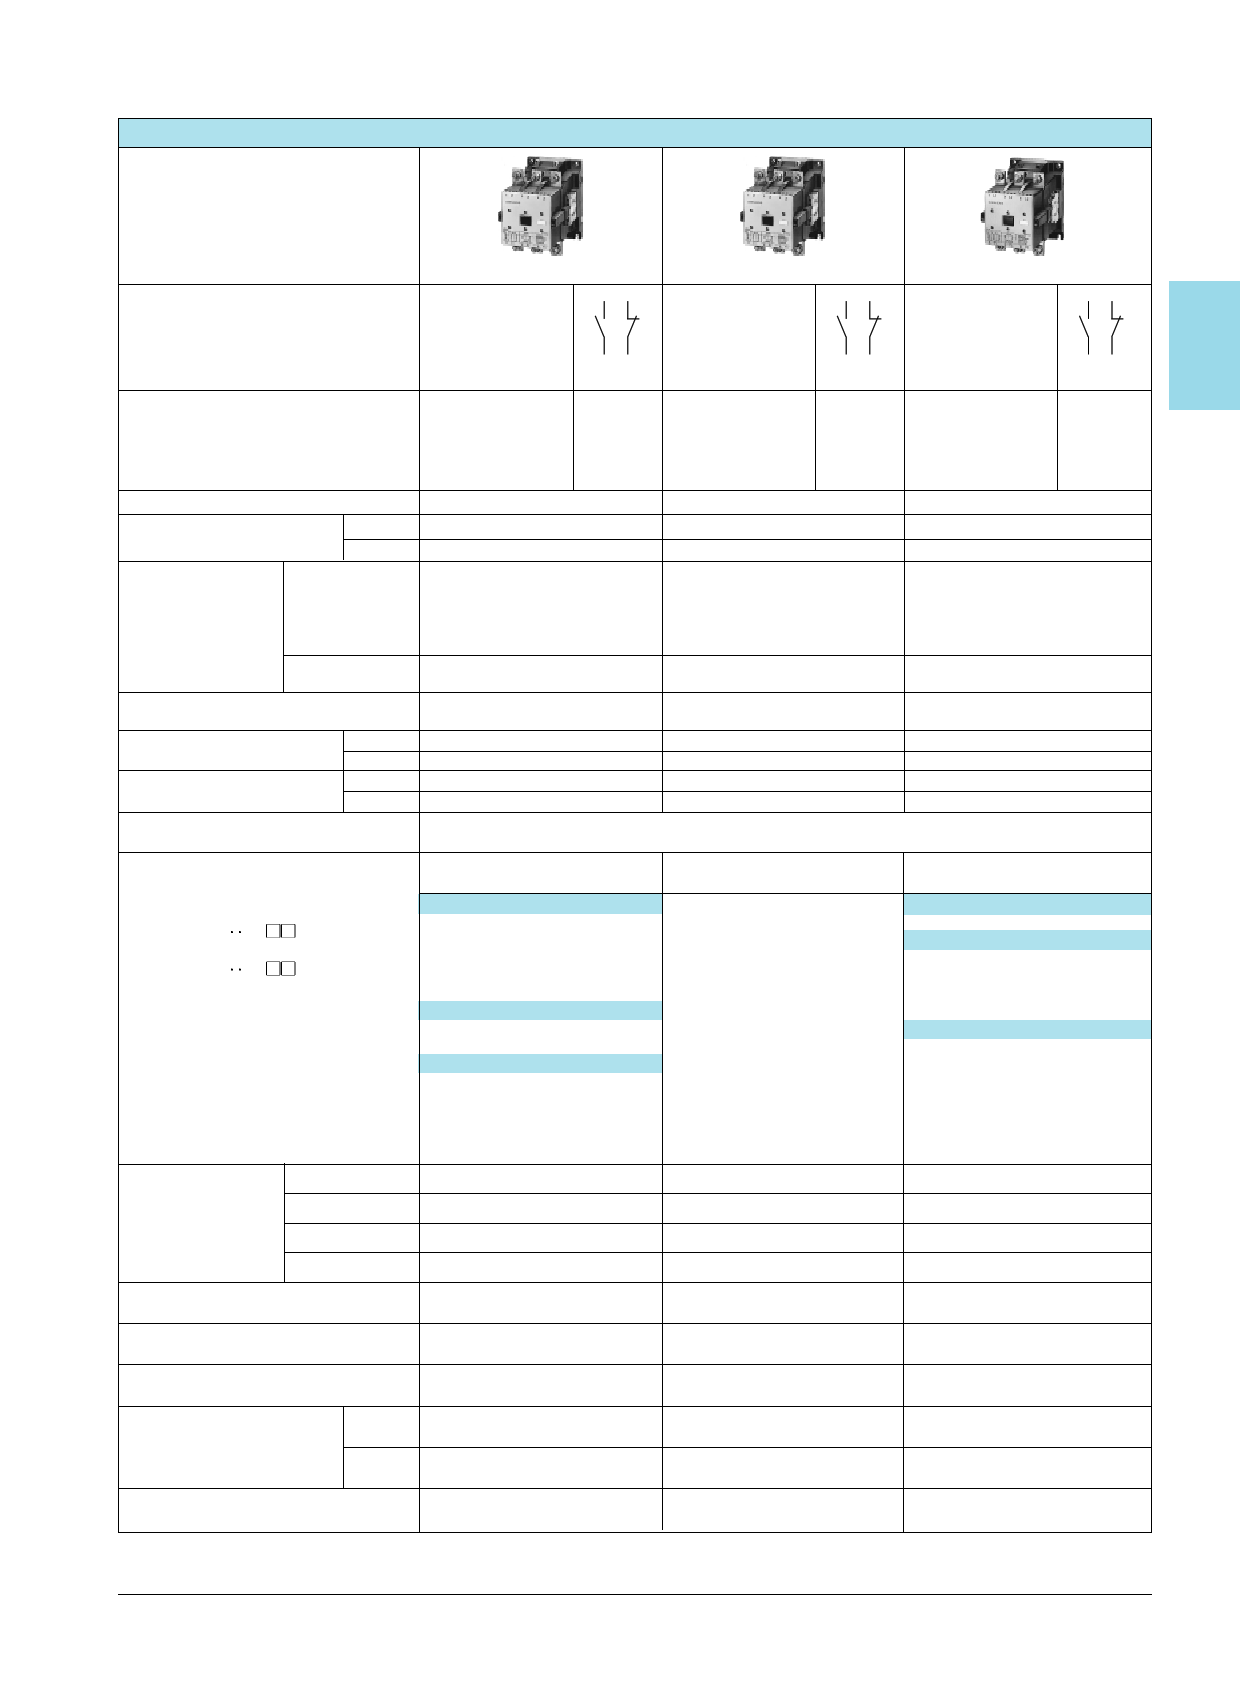 3TF43 Datasheet, Funktion